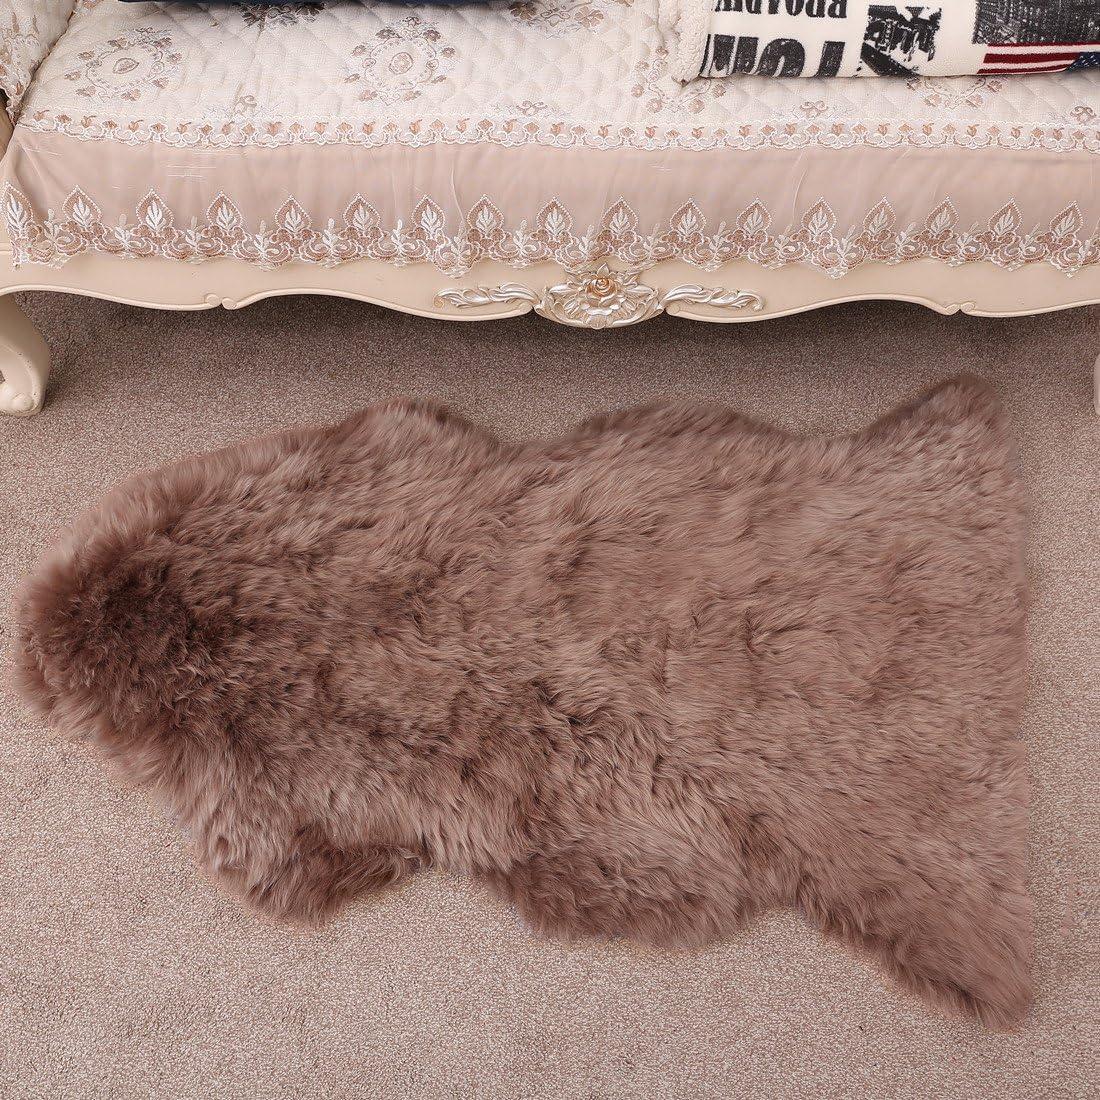 WYR Natural Genuine Sheepskin Rug Australian One Pelt 2 x3.5 Fur Rug Carpet Pad Blanket,Coffee